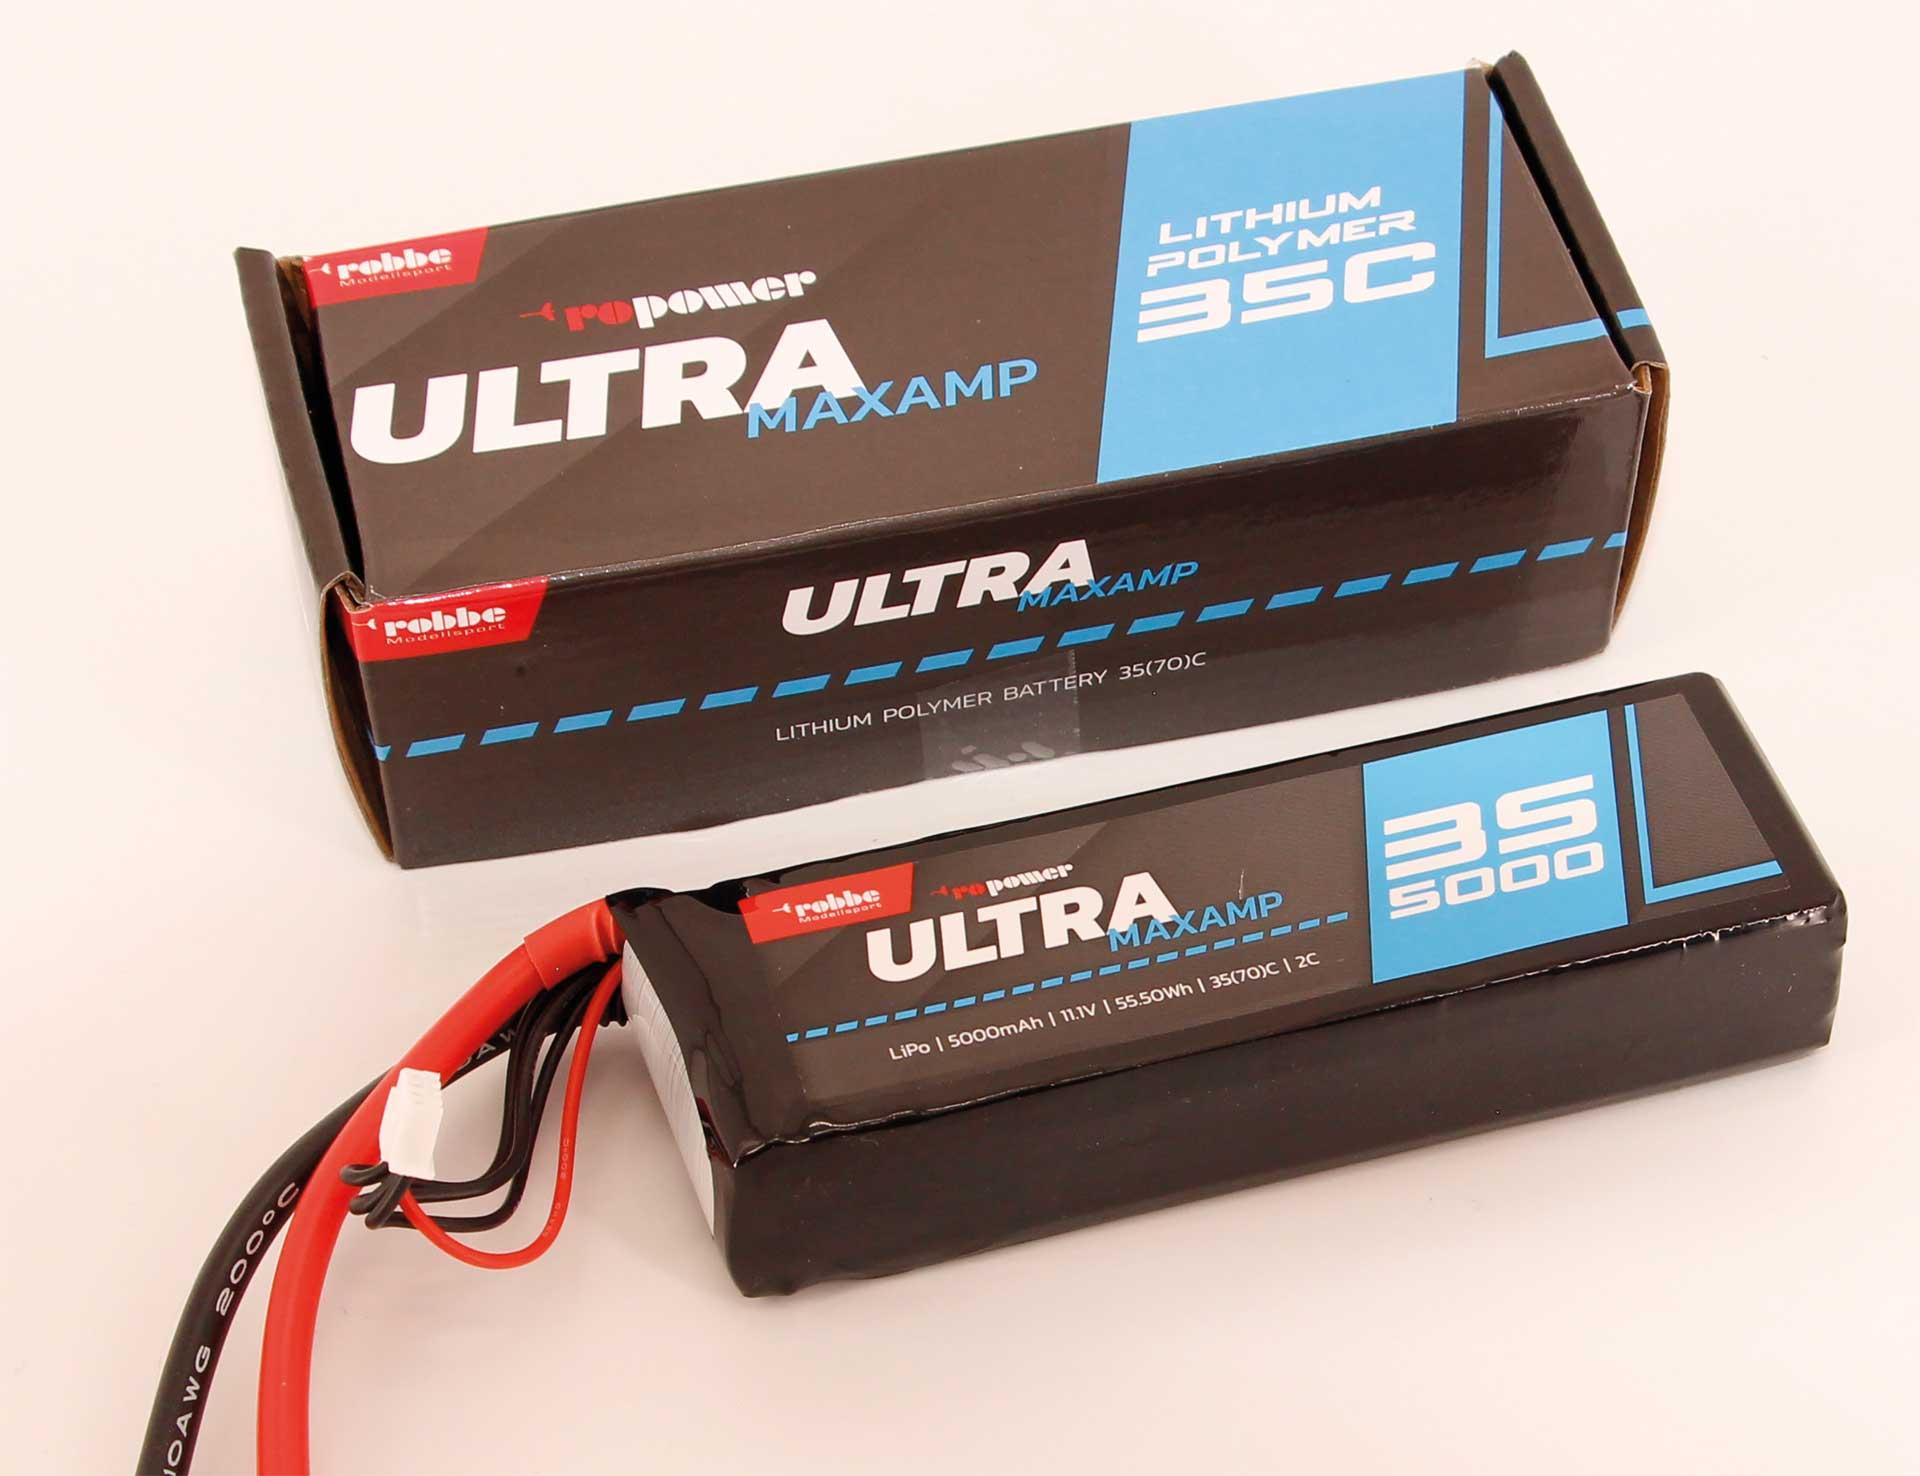 Robbe Modellsport RO-POWER ULTRA MAXAMP 5000MAH 11,1 VOLT 3S 35(70)C LIPO AKKU